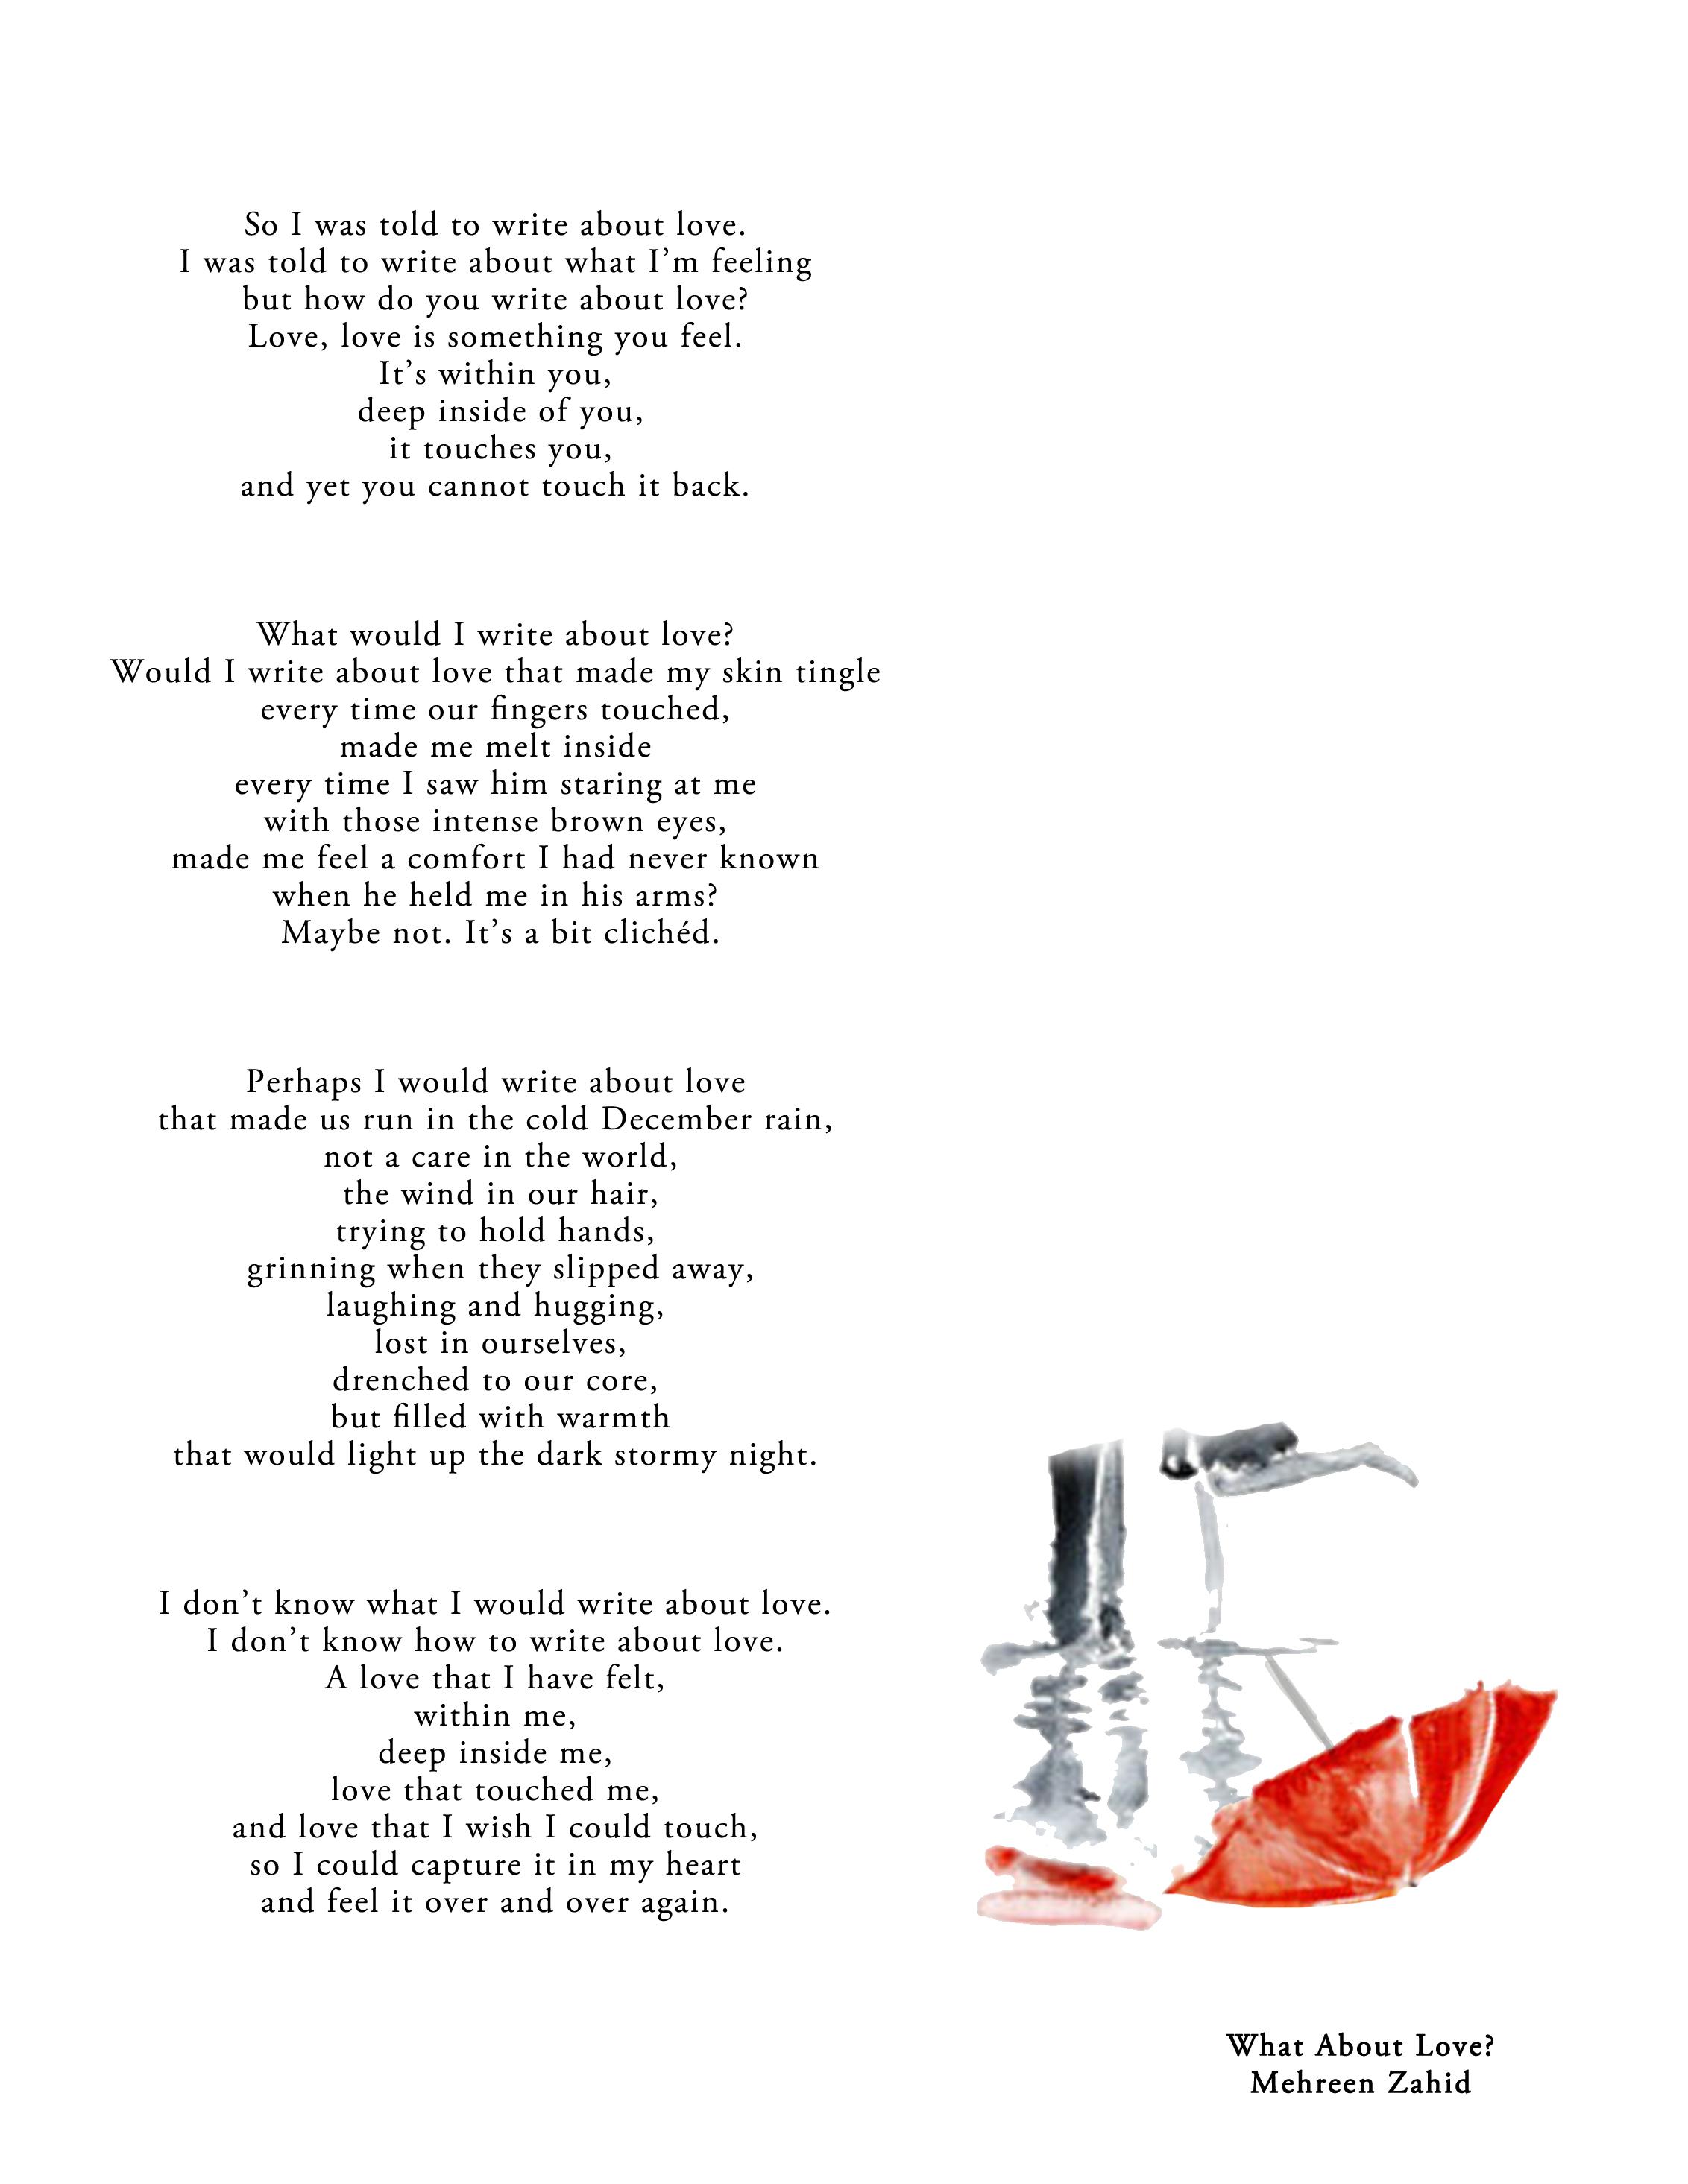 Mehreen Zahid - What about love.jpg